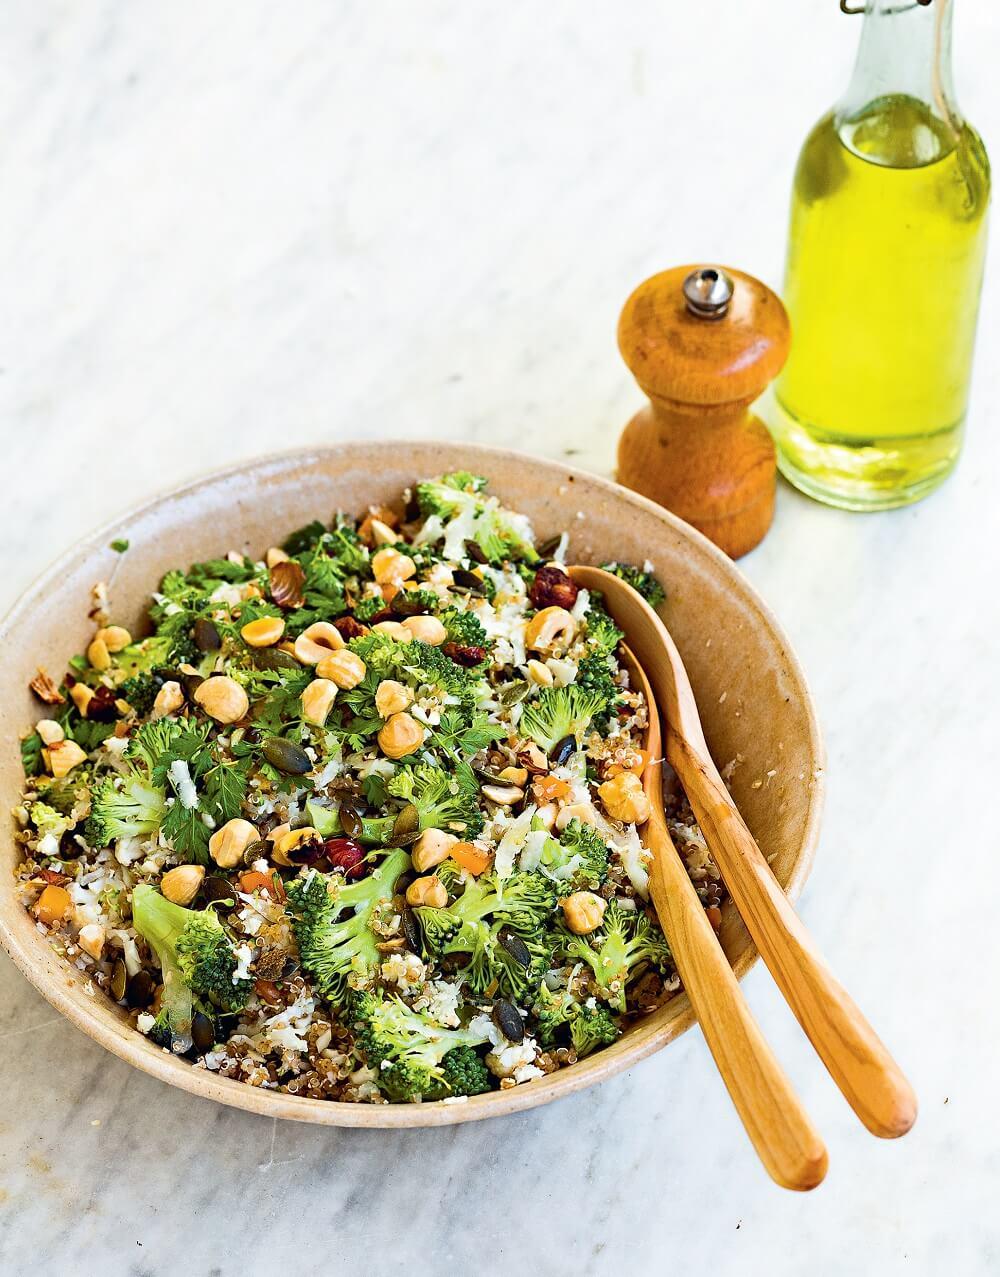 taboulé chou-fleur et quinoa